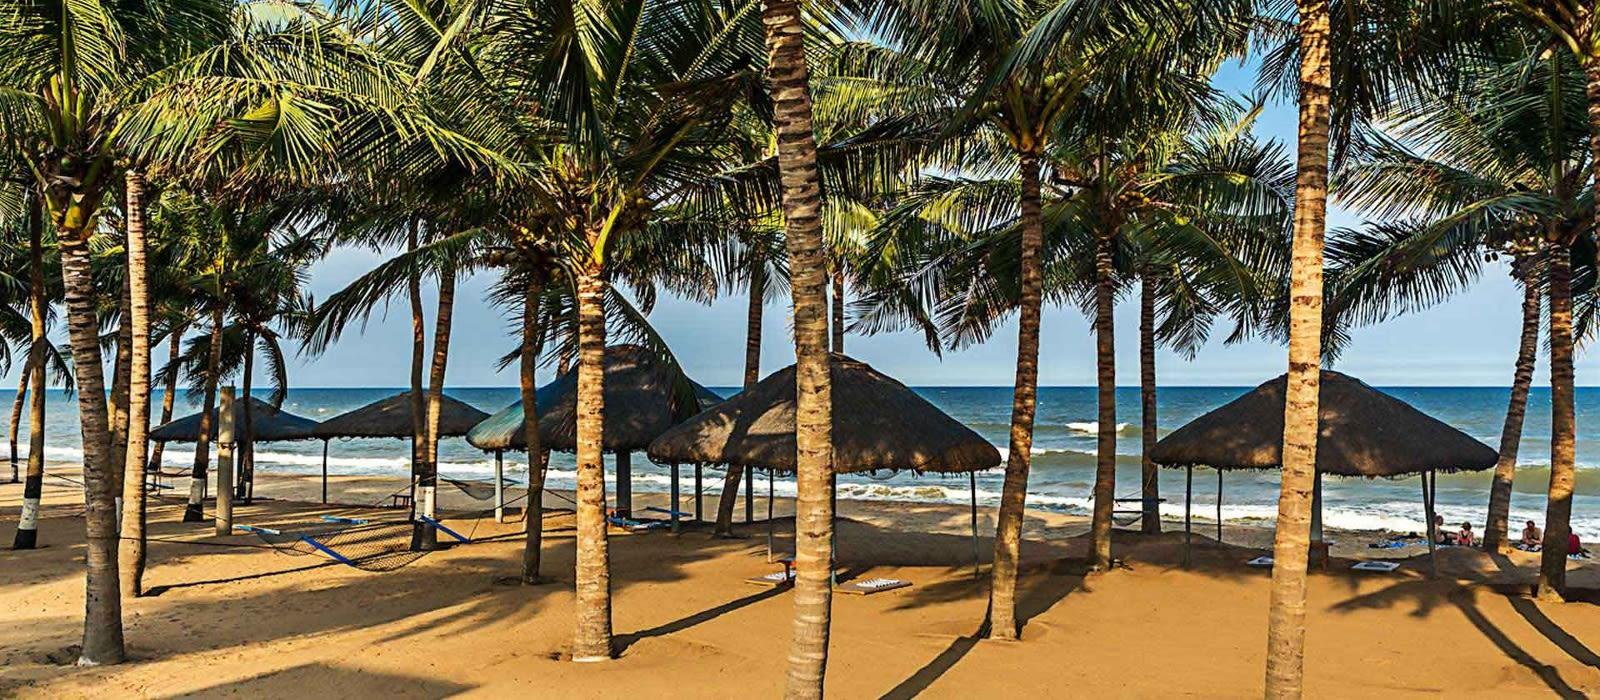 Hotel Ideal Beach Resort South India